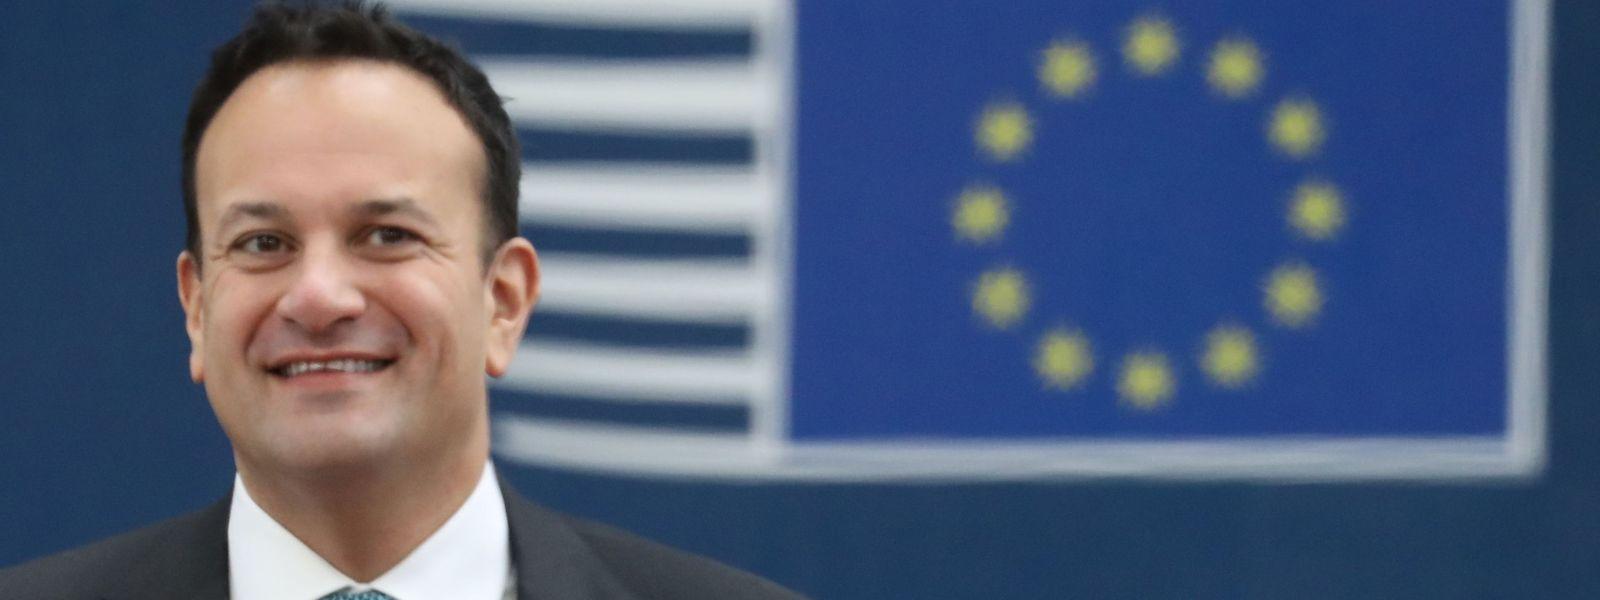 Irlands Premierminister Leo Varadkar beim EU-Haushaltsgipfel in Brüssel.